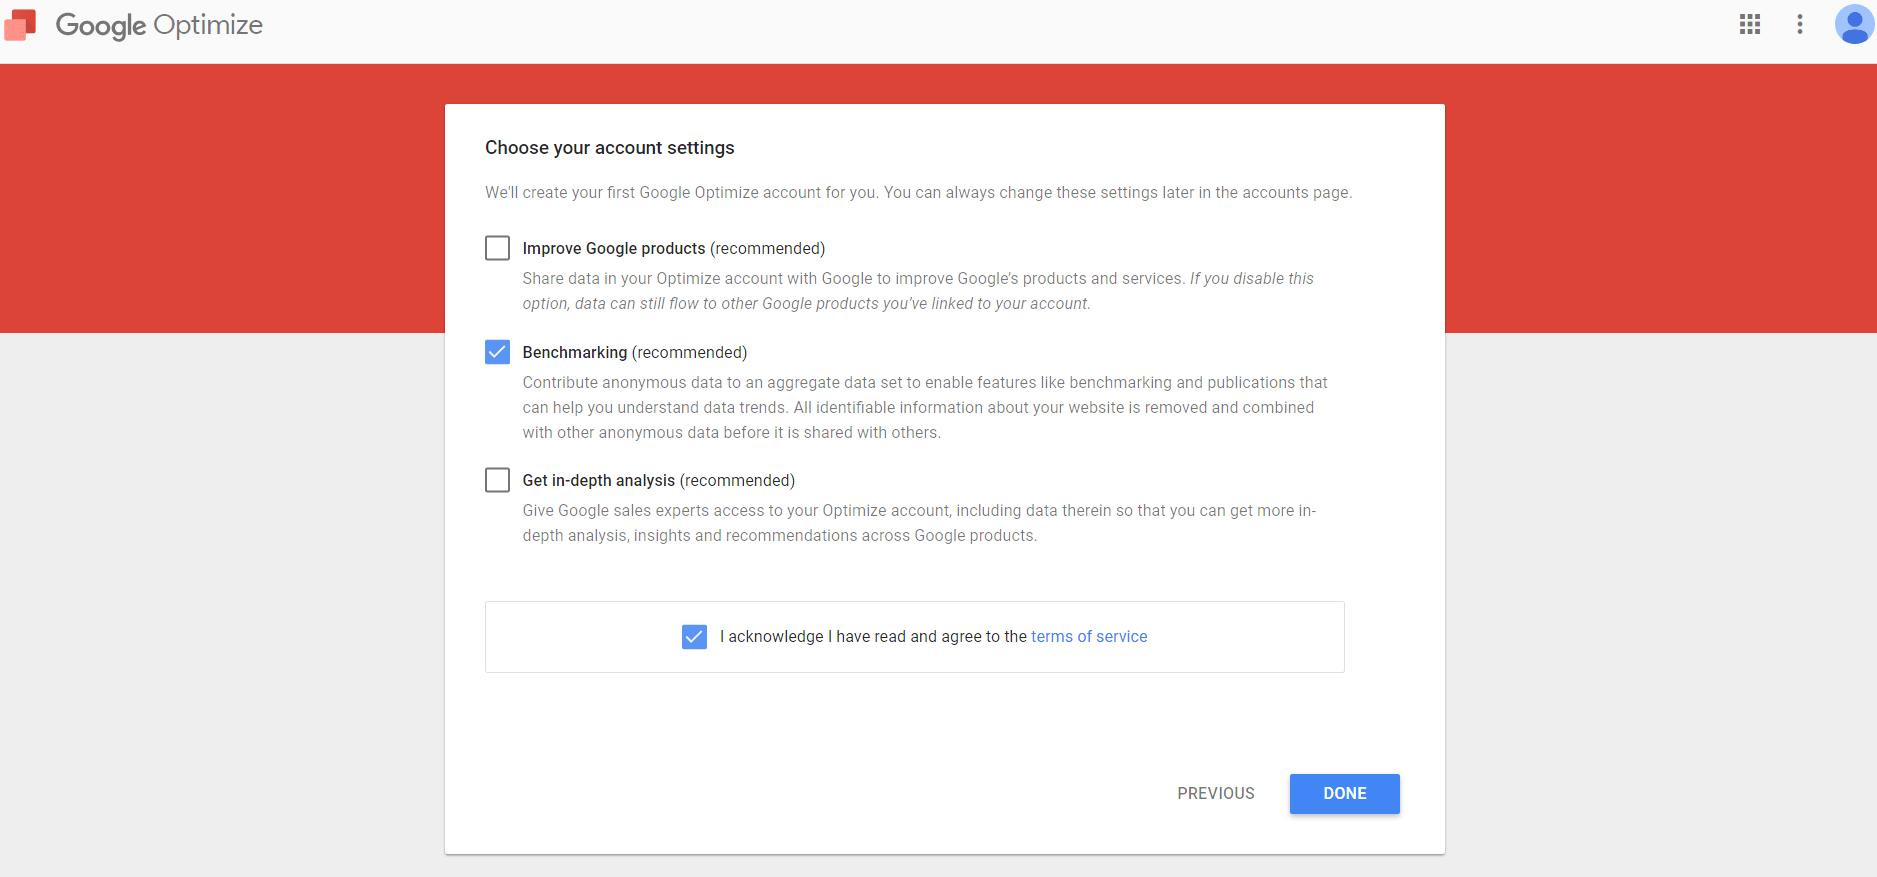 Bild: Google Optimize Account Setup - Account Einstellungen